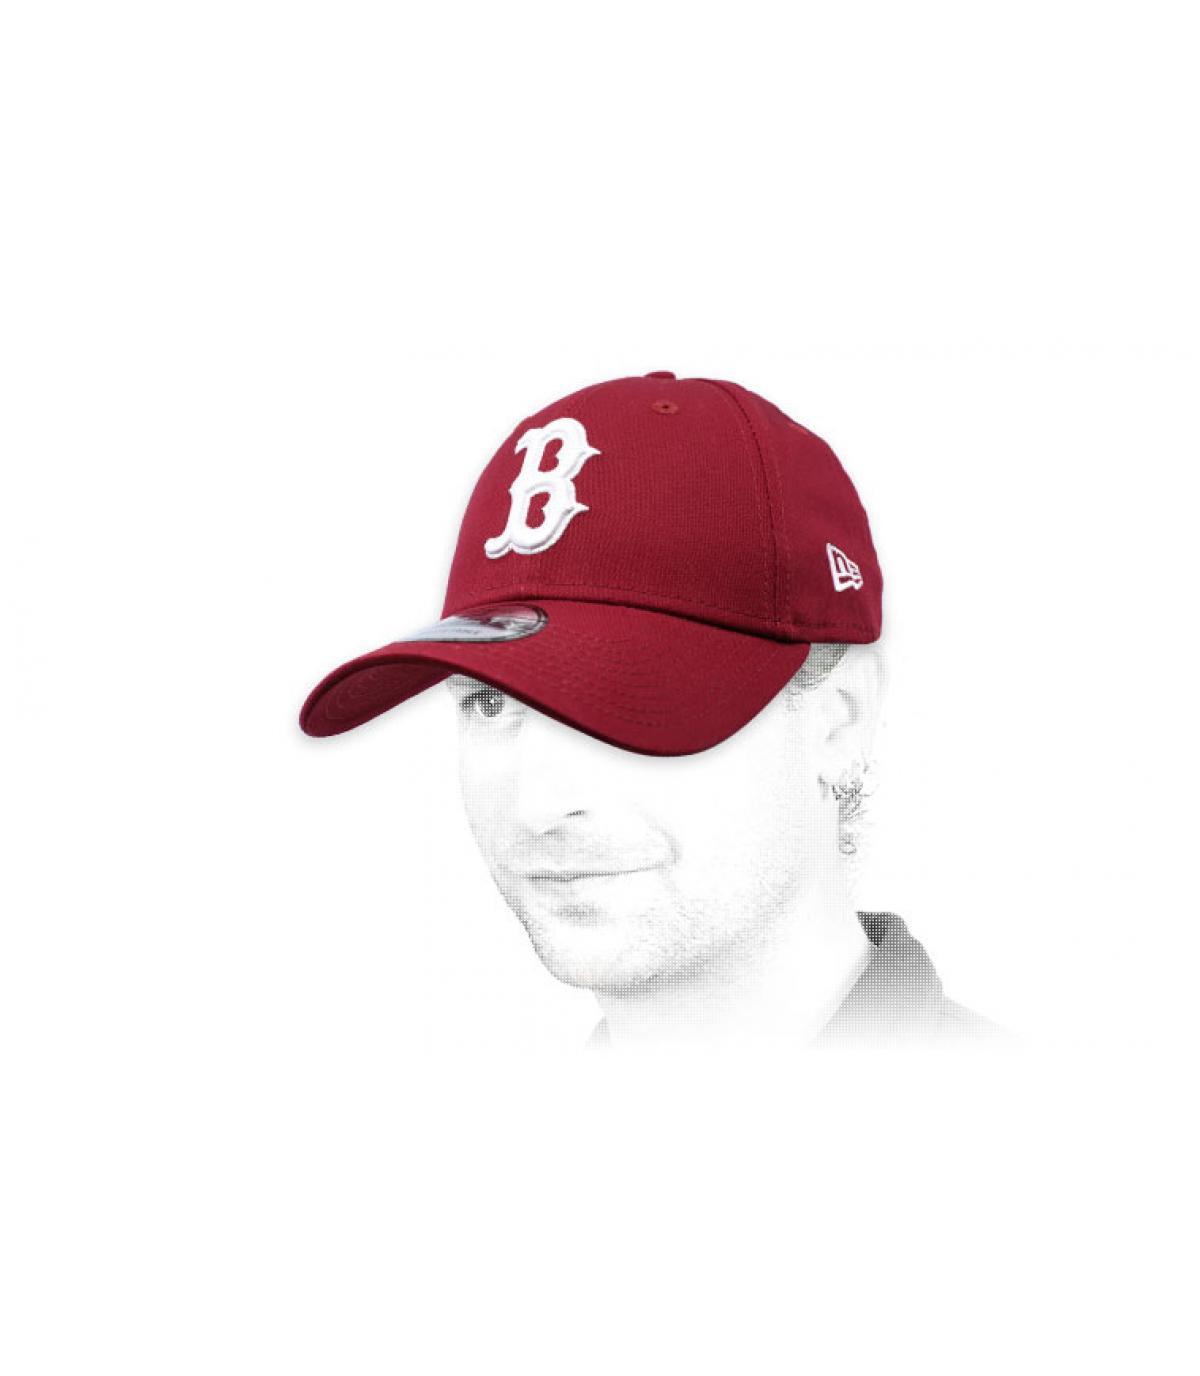 gorra curva B burdeos